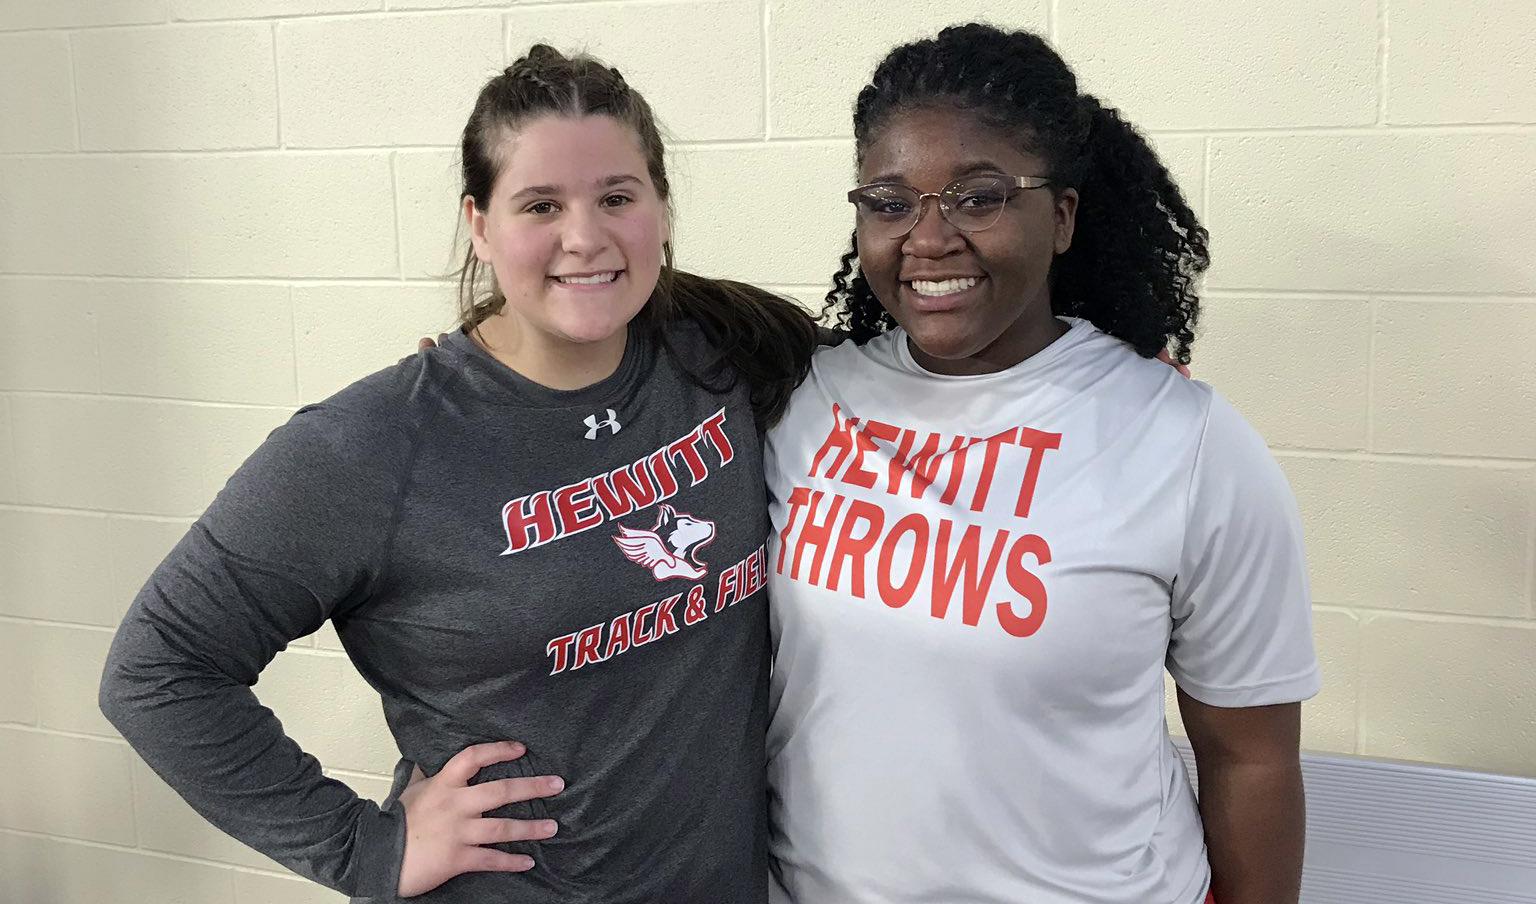 Introducing your 2020 Class 7A shot put state champion: Hewitt-Trussville's Lea Townsend